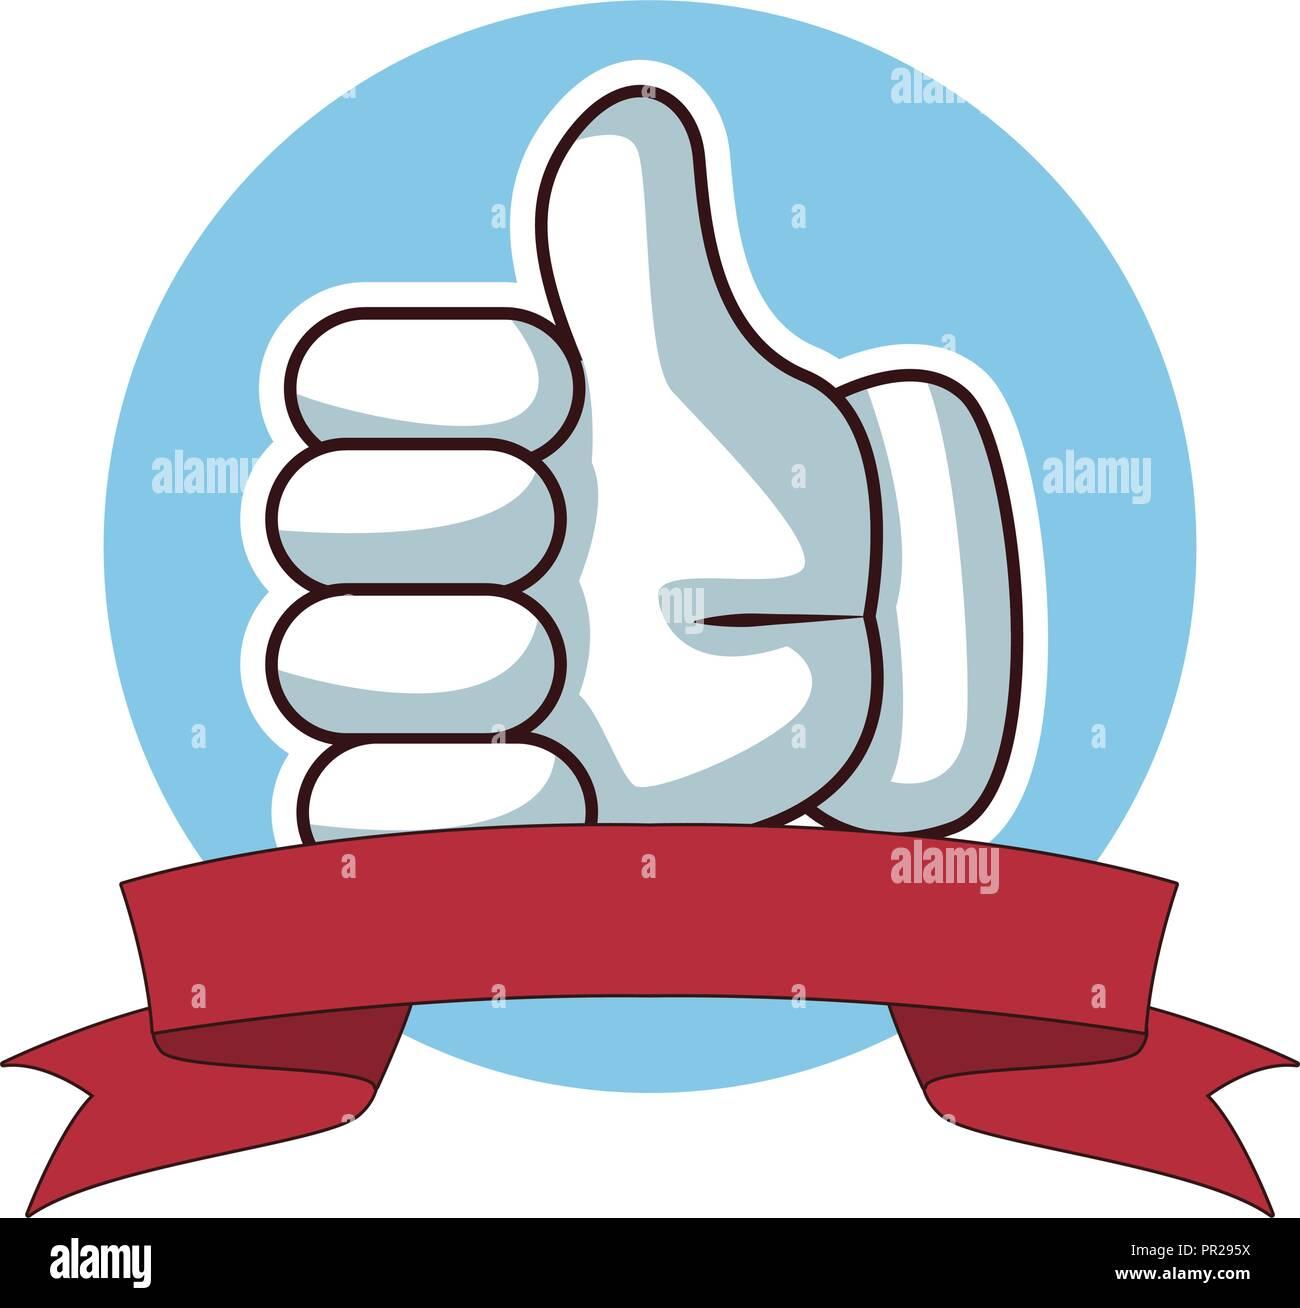 Thumb up hand - Stock Image